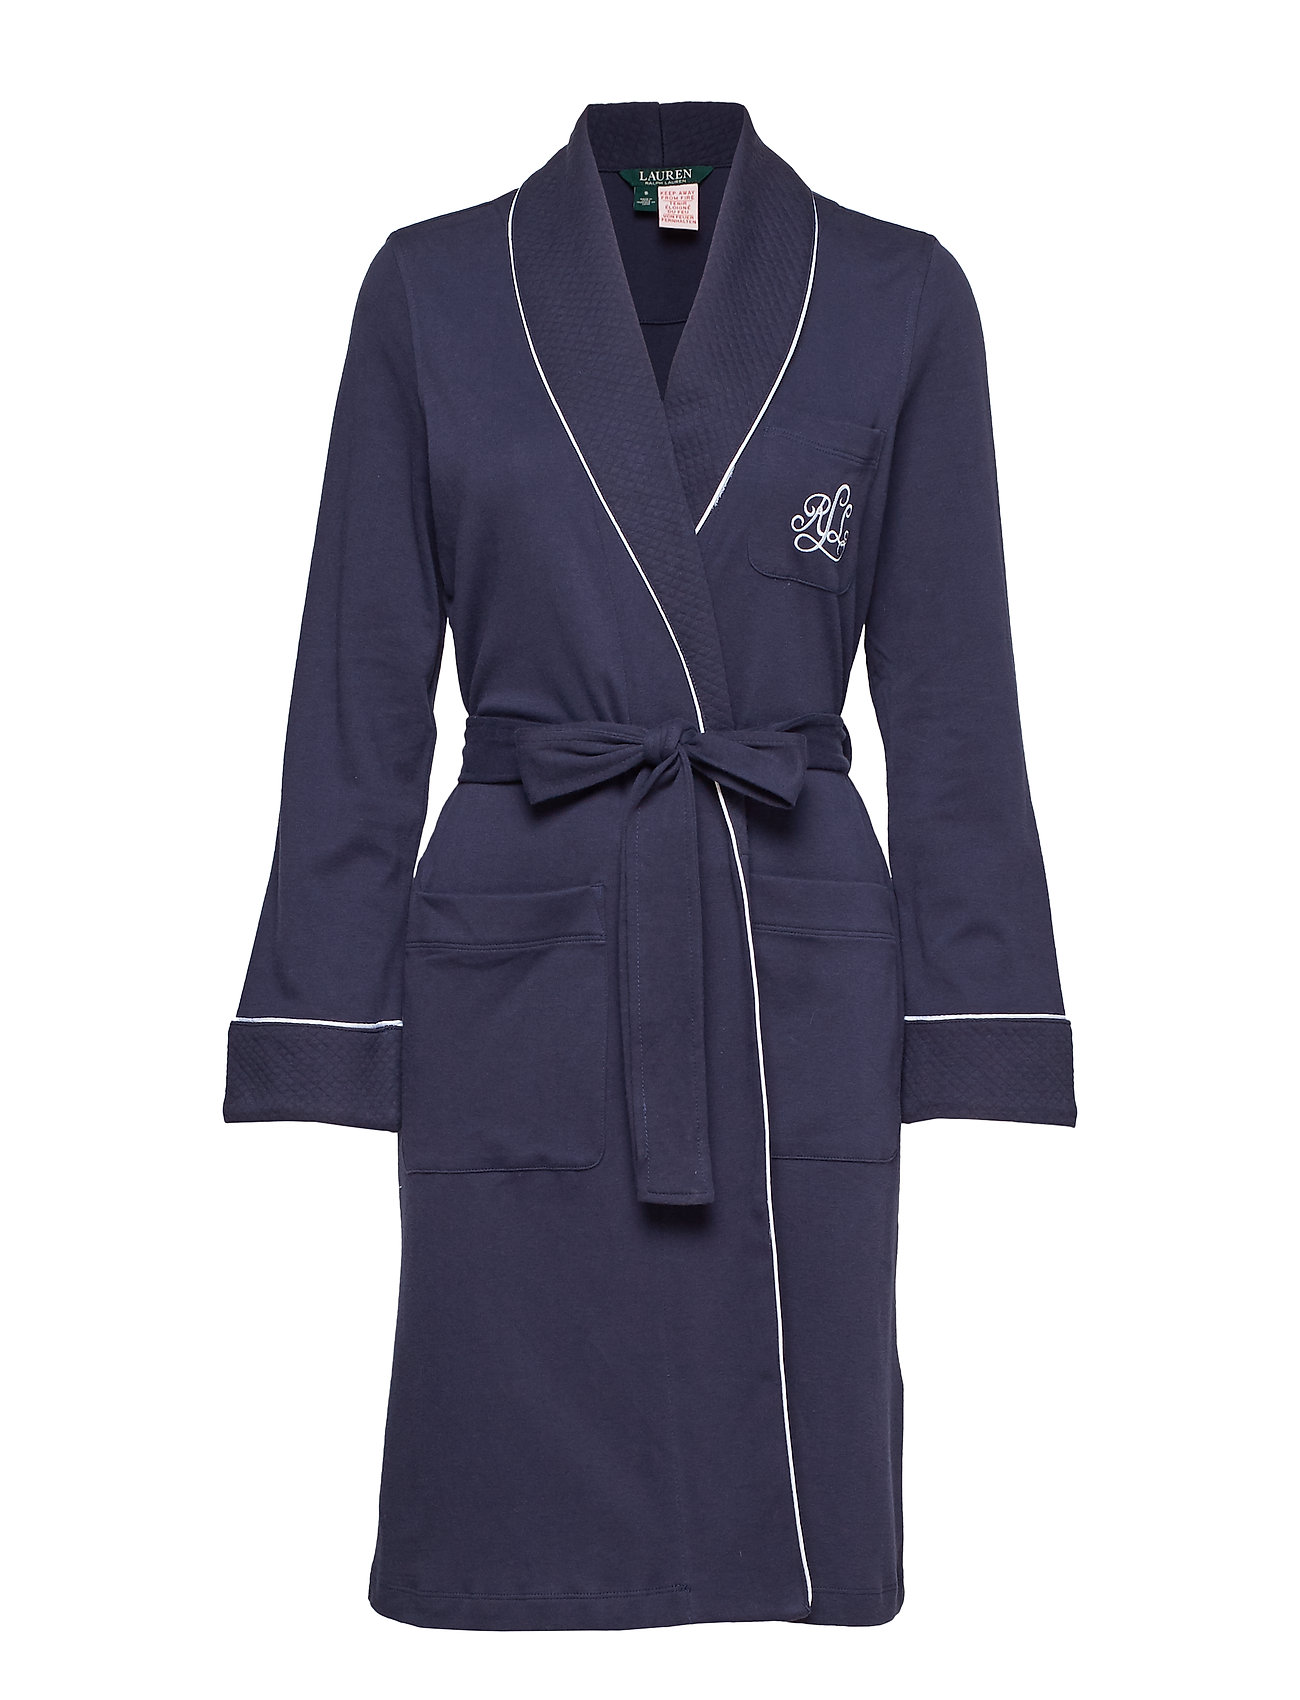 Essential Robenavy Homewear Lrl Collar WindsorLauren Quilted Ralph wkZTPXliOu